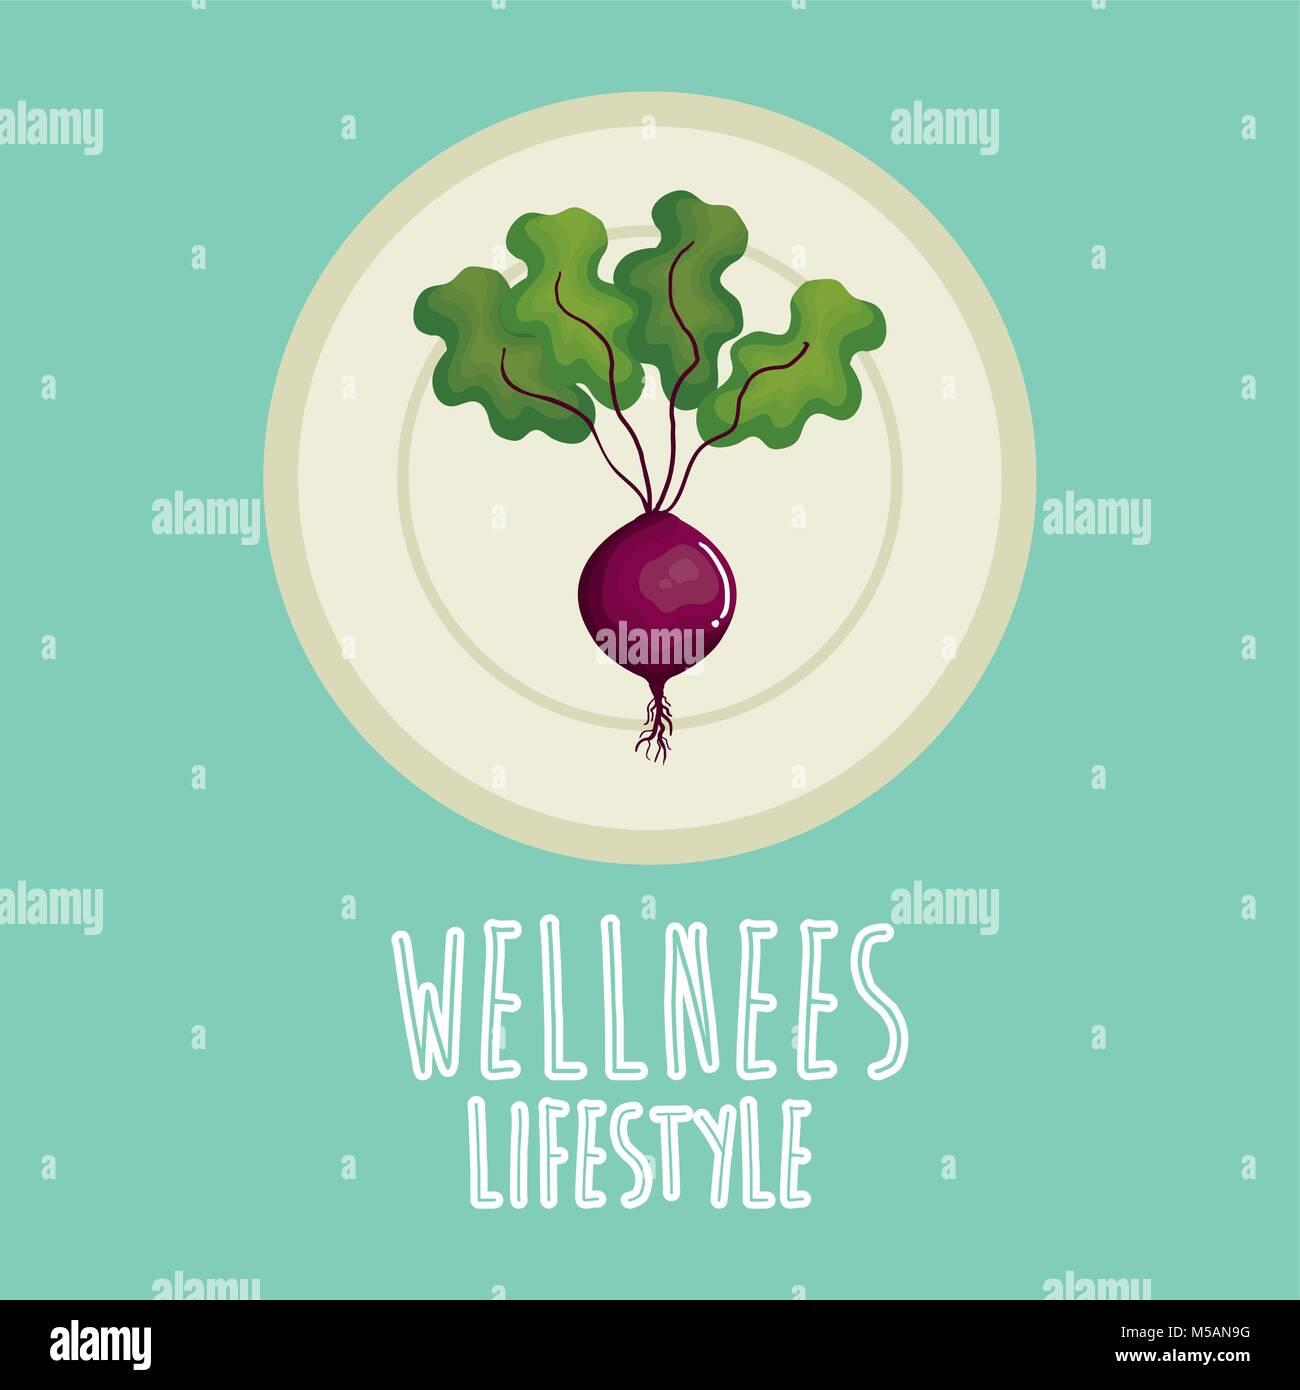 garlic vegetable wellness lifestyle - Stock Vector